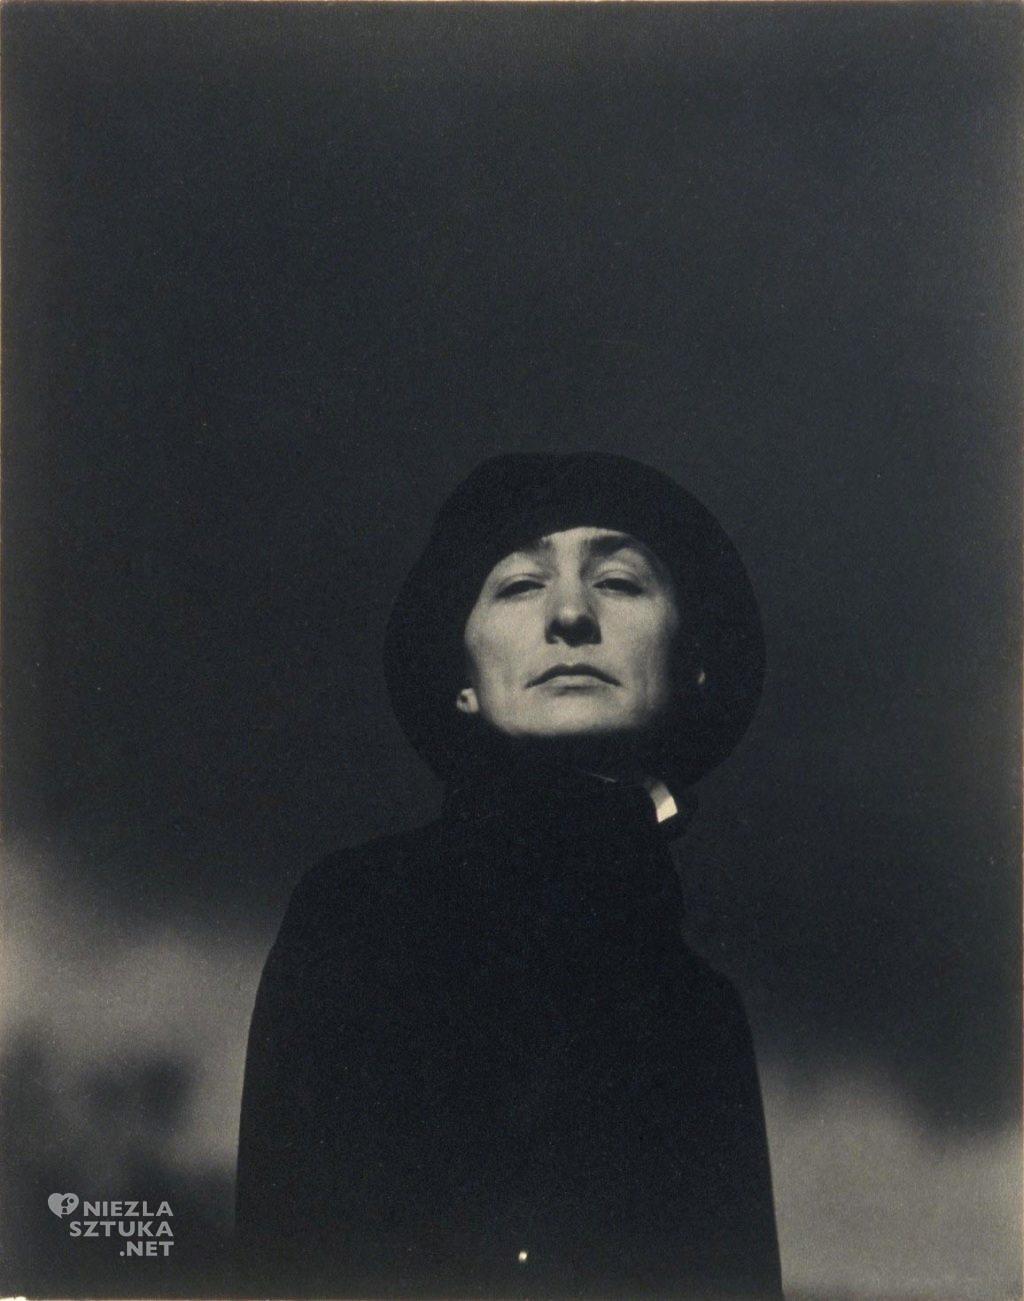 Alfred Stieglitz Georgia O'Keeffe, fot.: thecharnelhouse.org